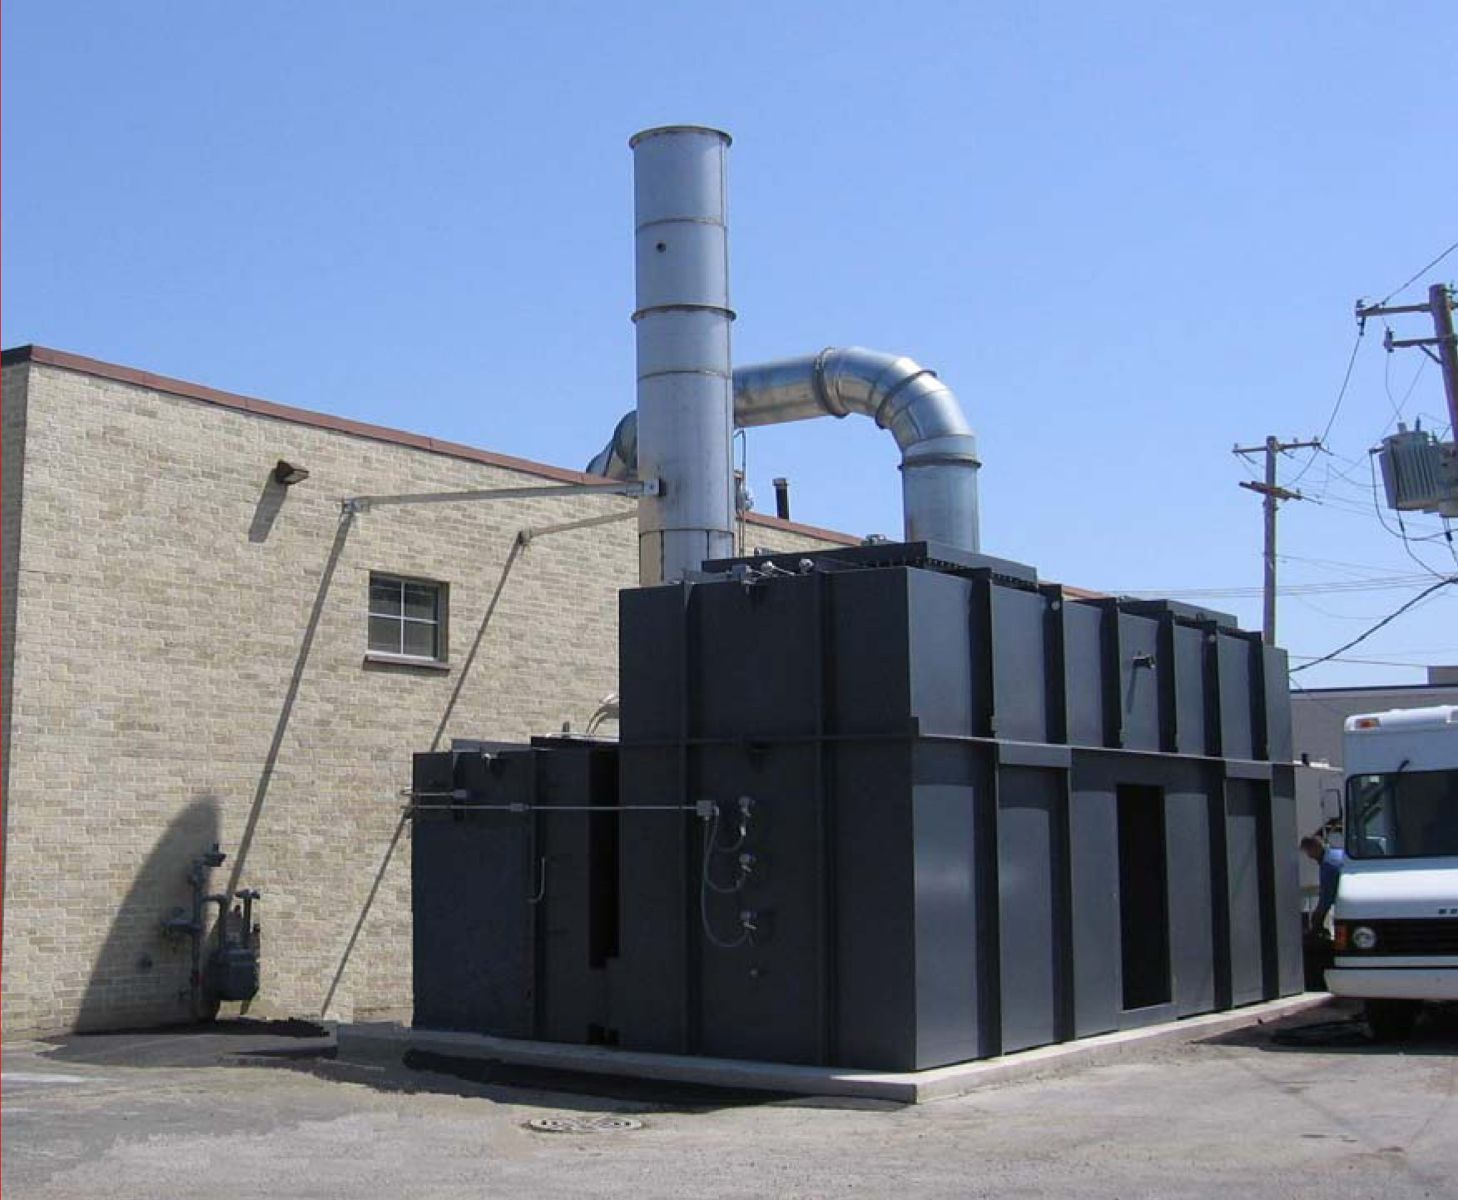 Regenerative Thermal Oxidizer, TRITON Series, Flexographic Printer Project